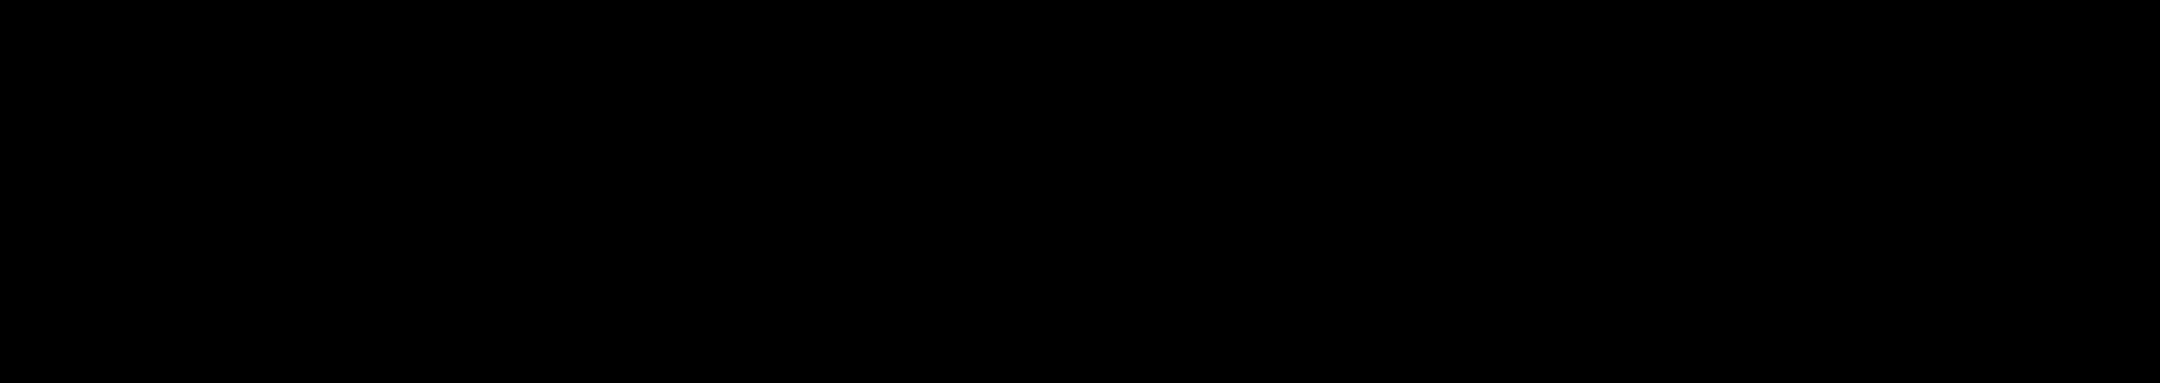 timberland logo 1 - Timberland Logo